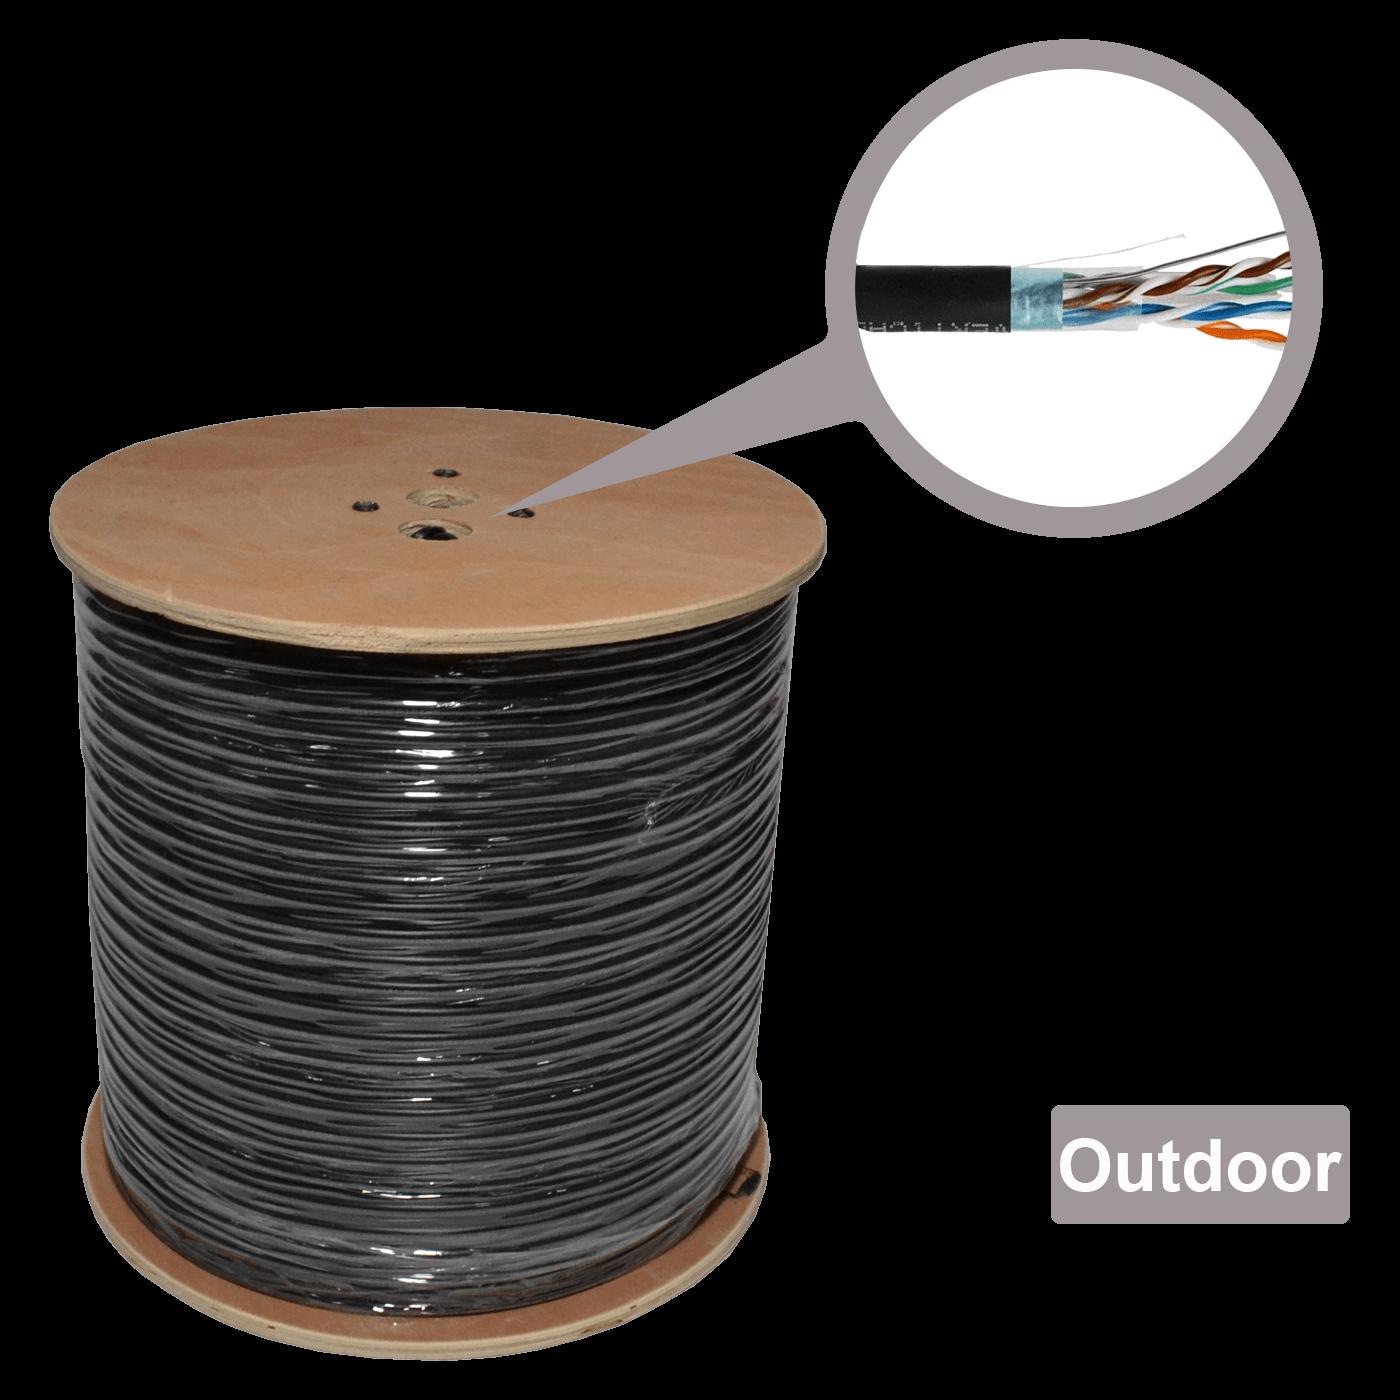 Mrežni FTP kabl, CAT5e, Outdoor, 305 met